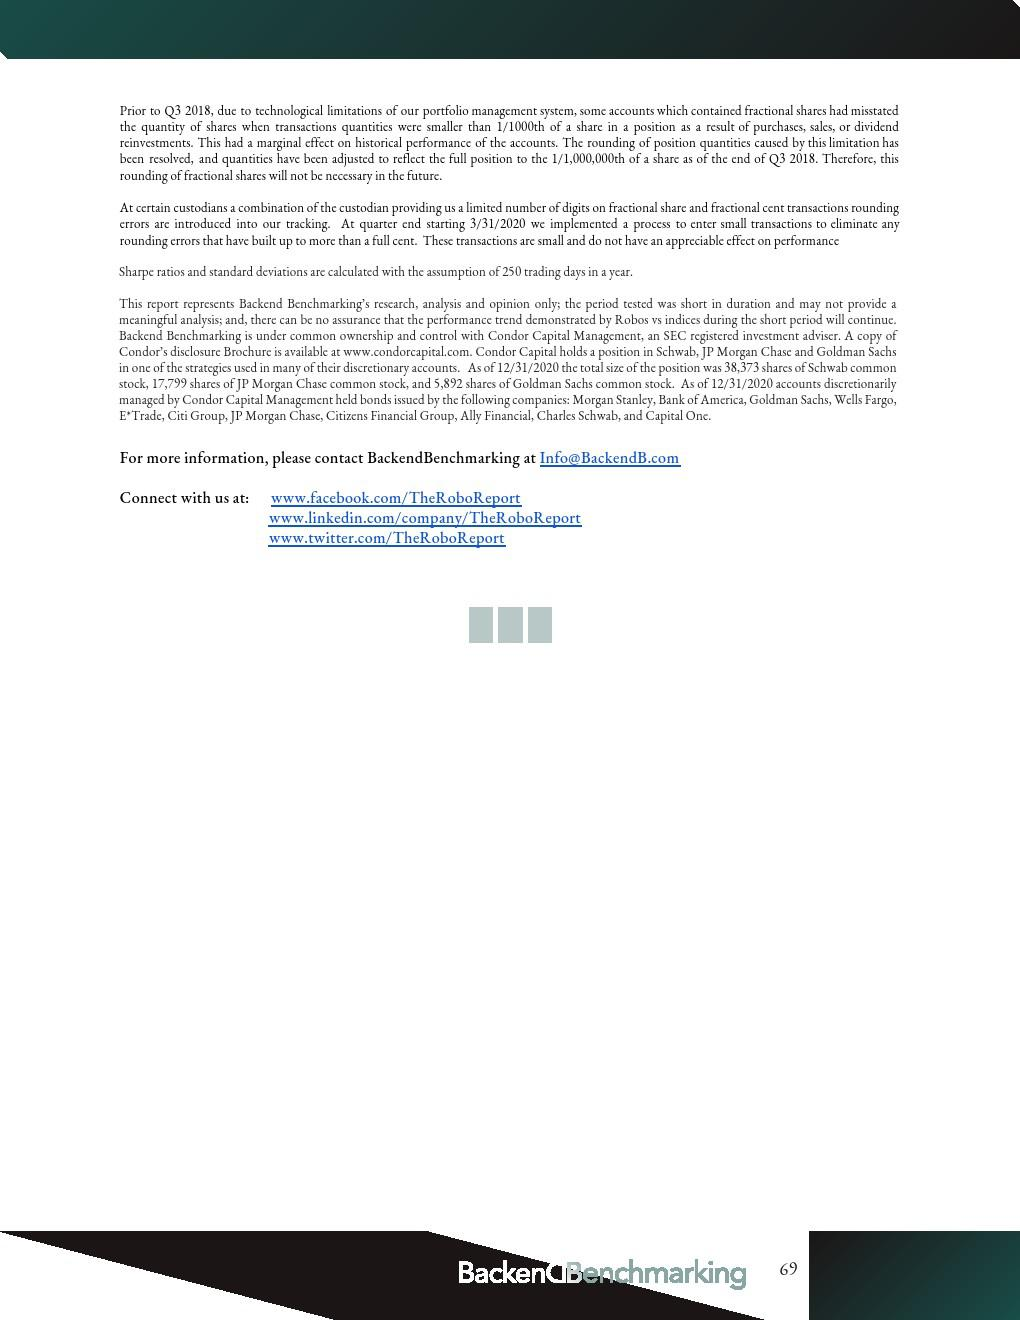 BackendBenchmarking:2020年第四季機器人報告